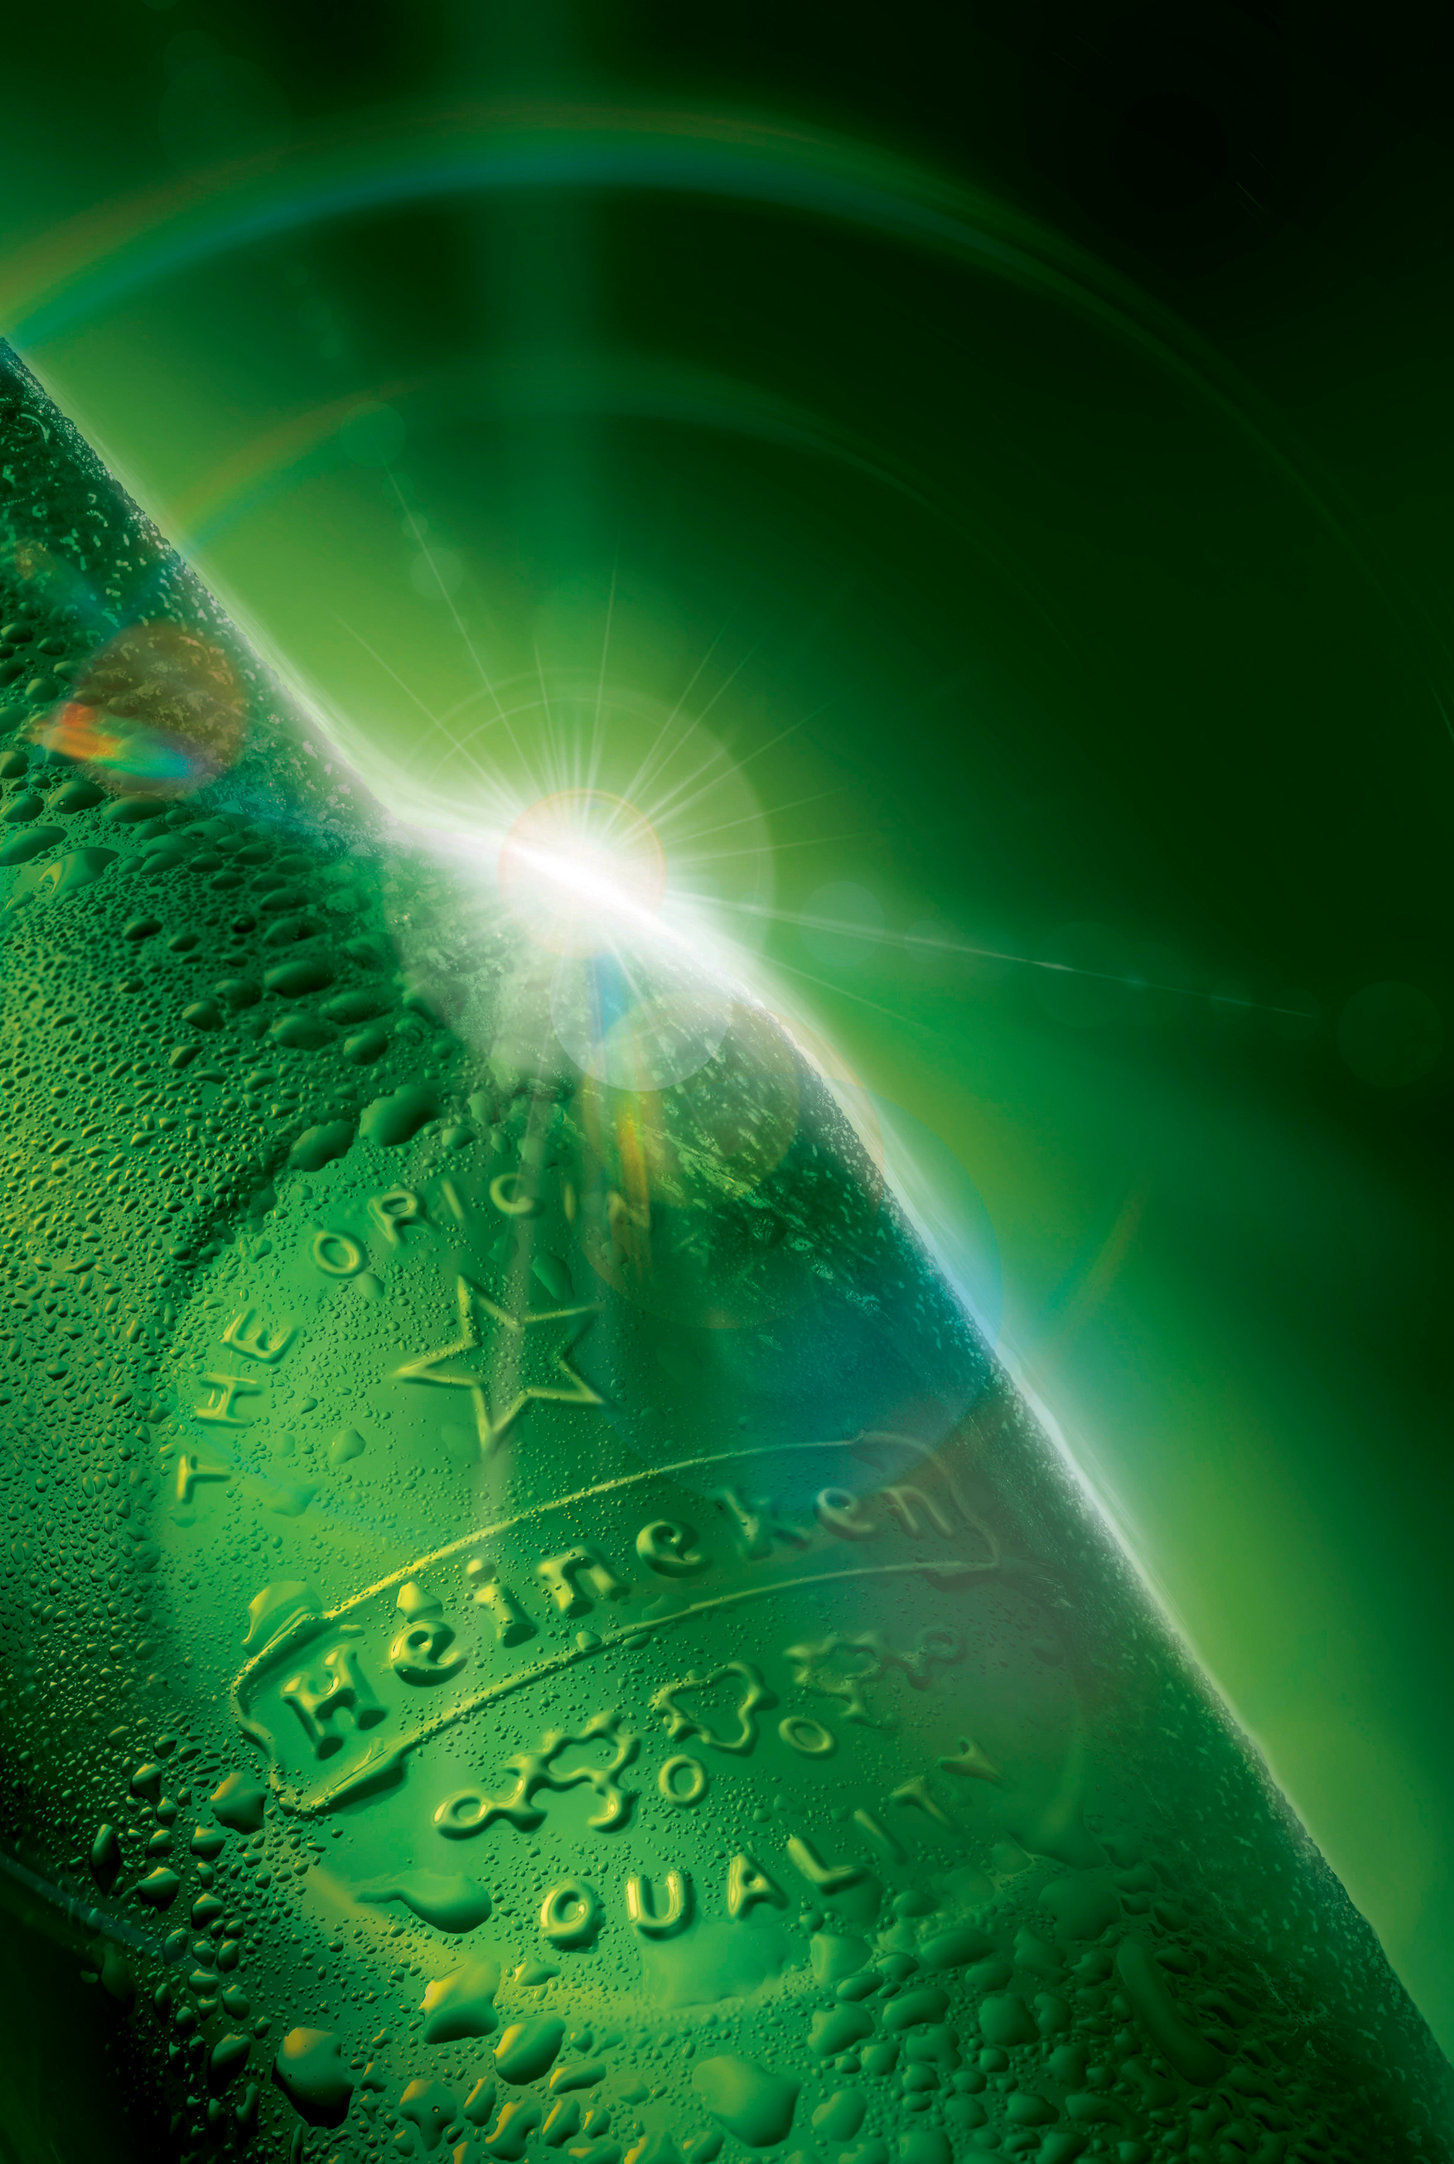 Heineken_Crop_2_rgb.jpg